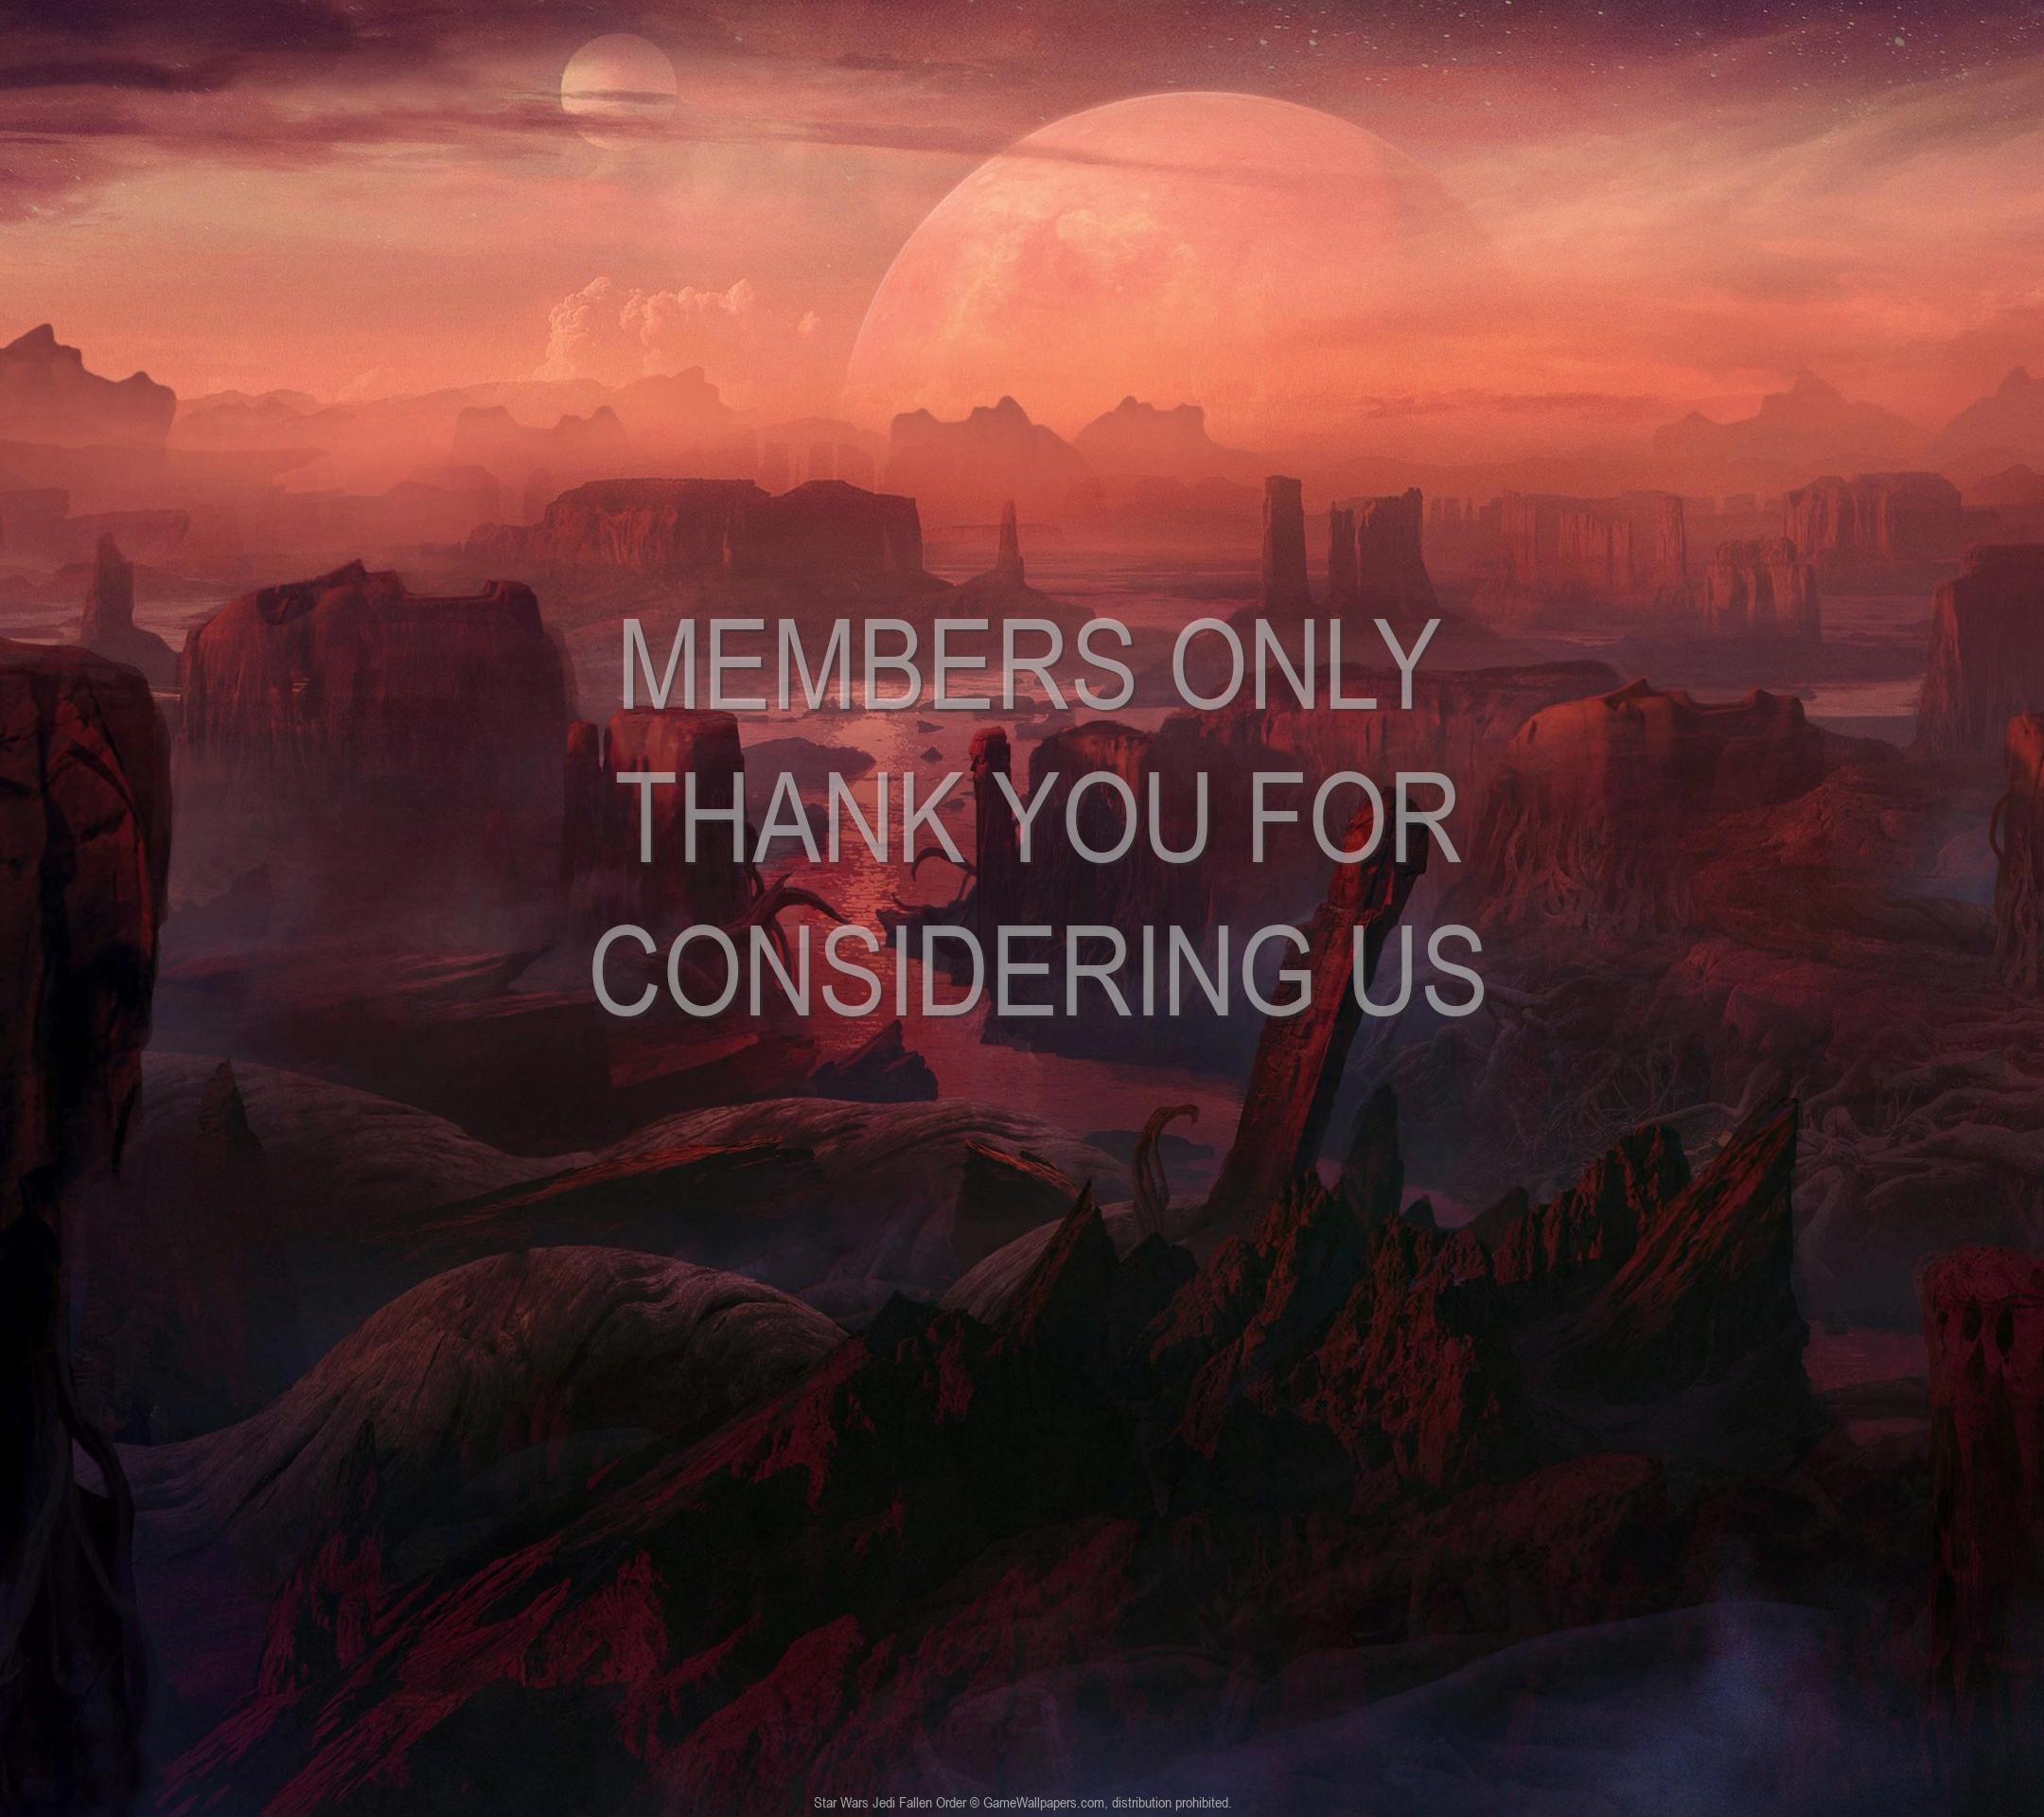 Star Wars Jedi: Fallen Order 1920x1080 Mobile wallpaper or background 07